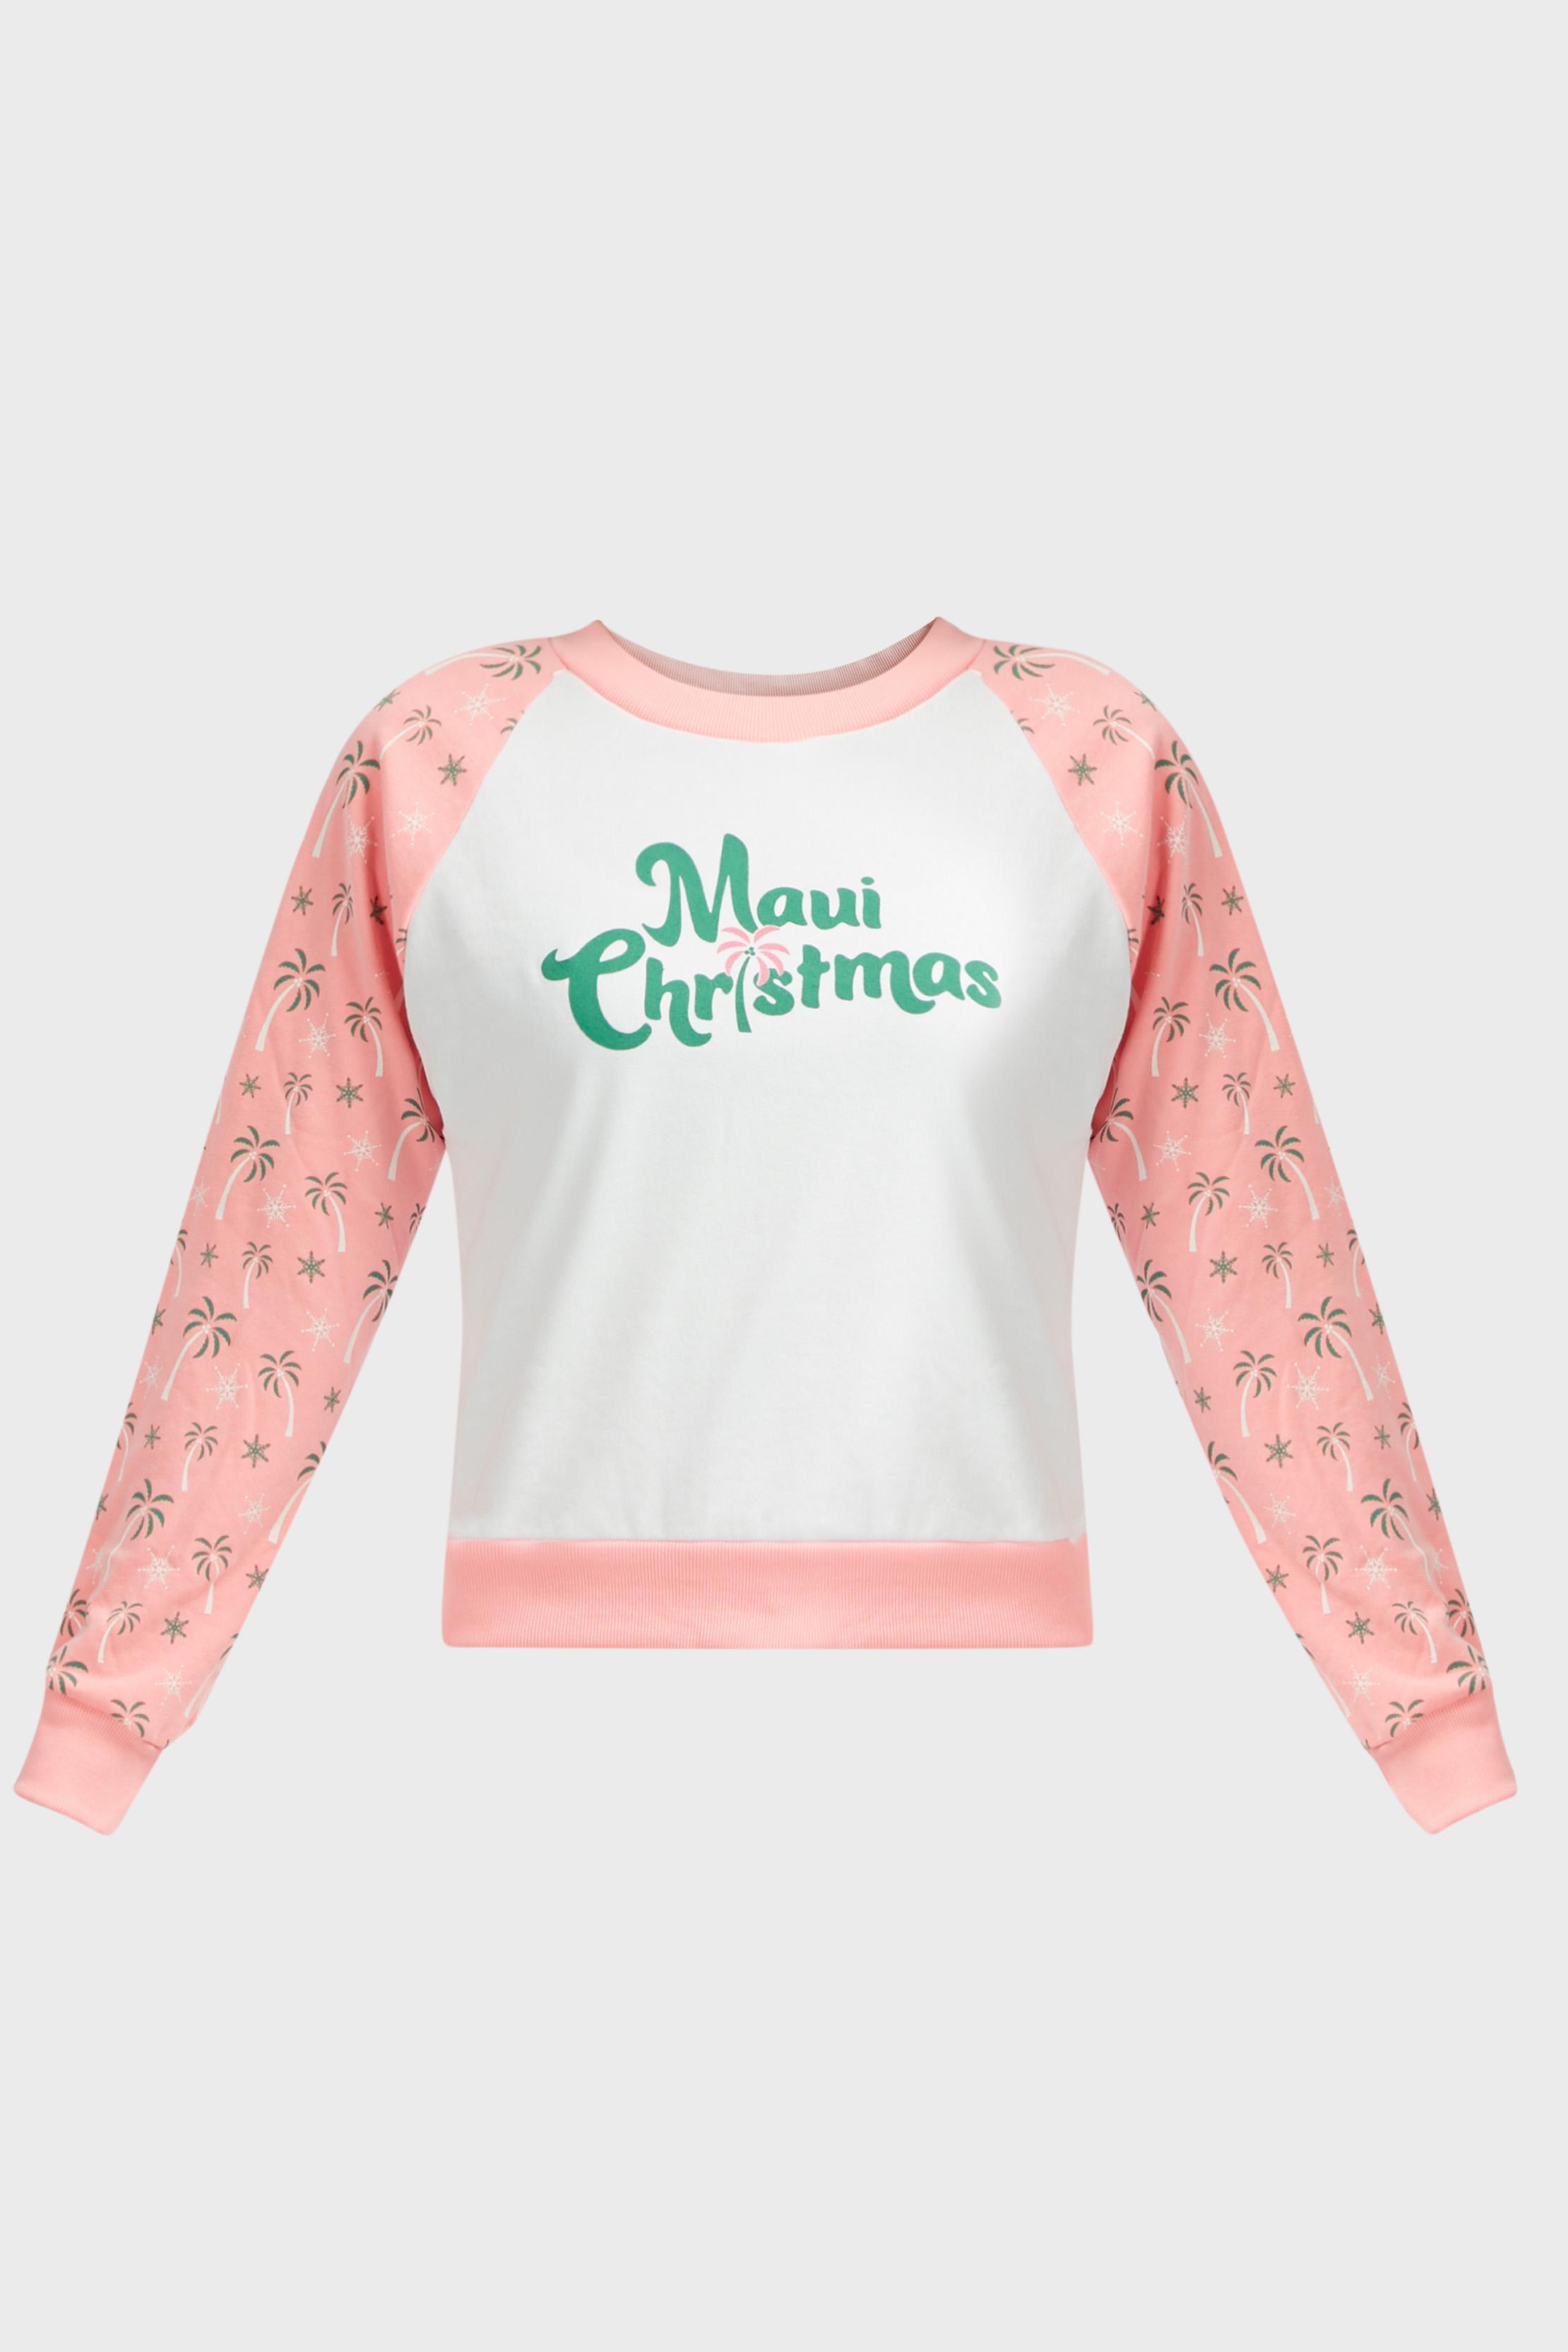 Wildfox Christmas.Wildfox Fiona Maui Christmas Sweatshirt In Pink Lyst